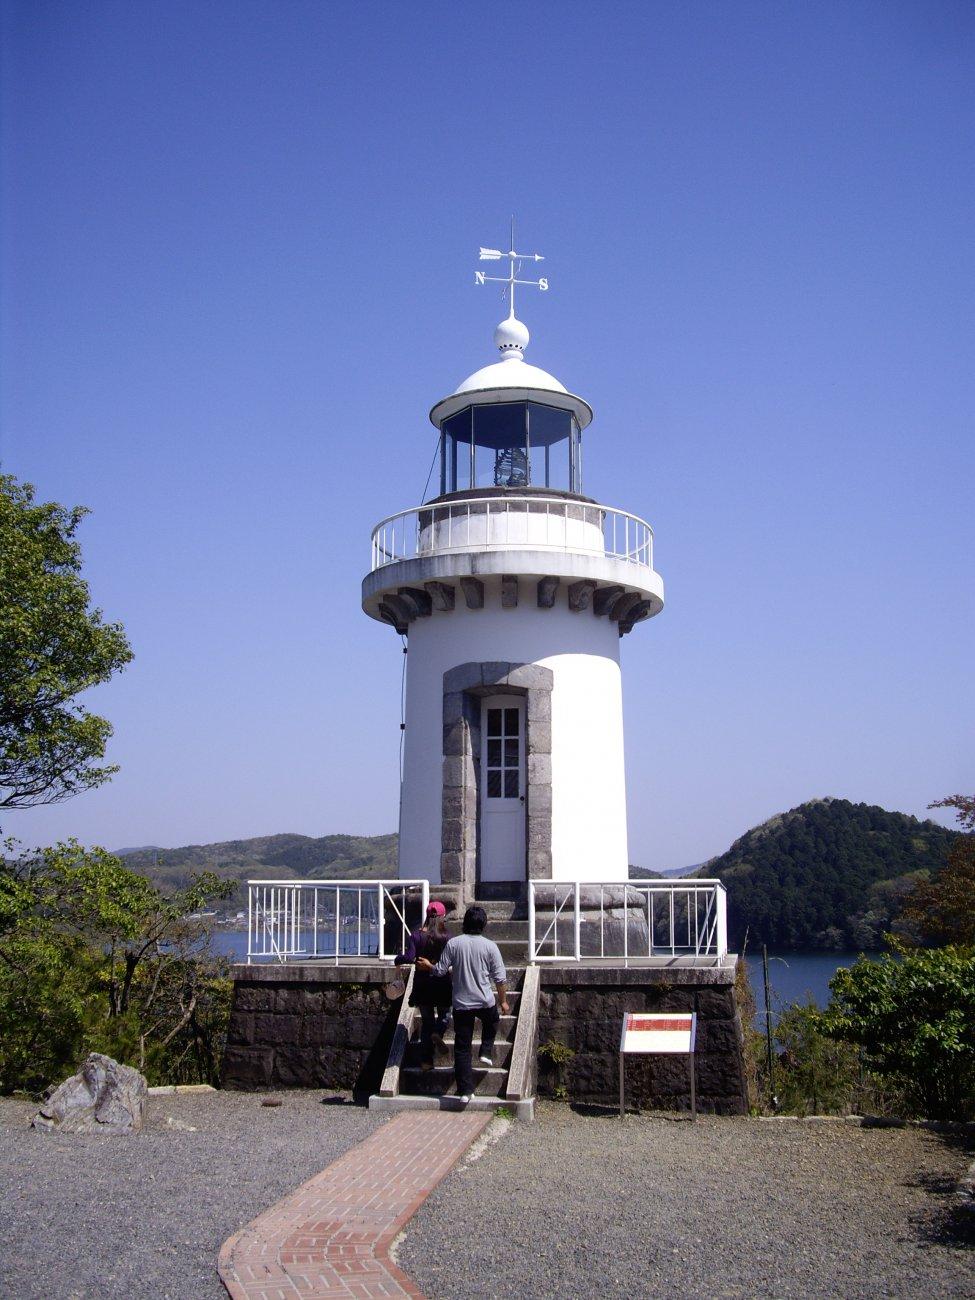 1870Meiji-Mura_3881615281_761a0c084e.jpg